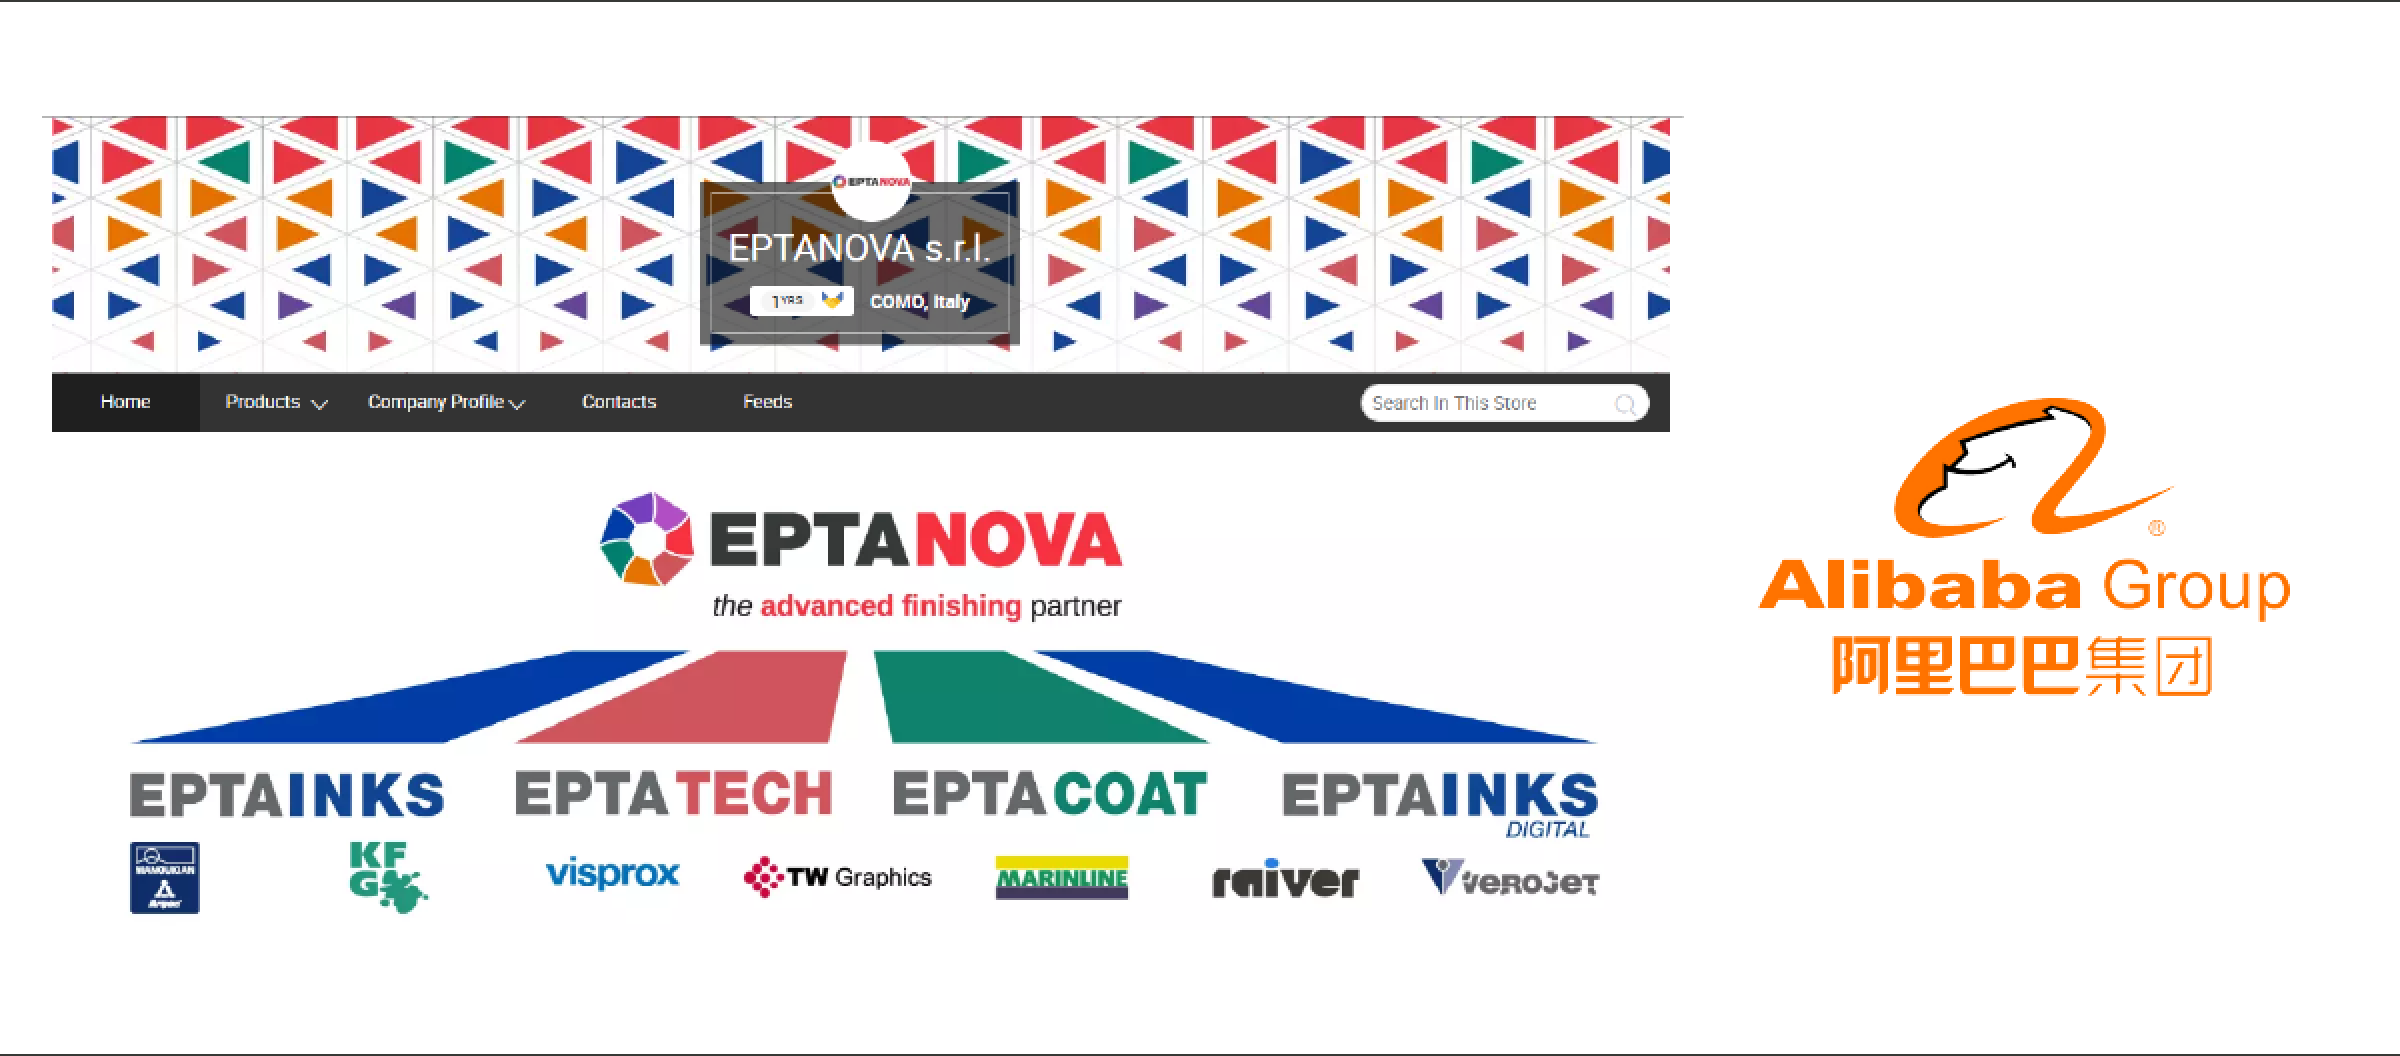 Eptanova Alibaba